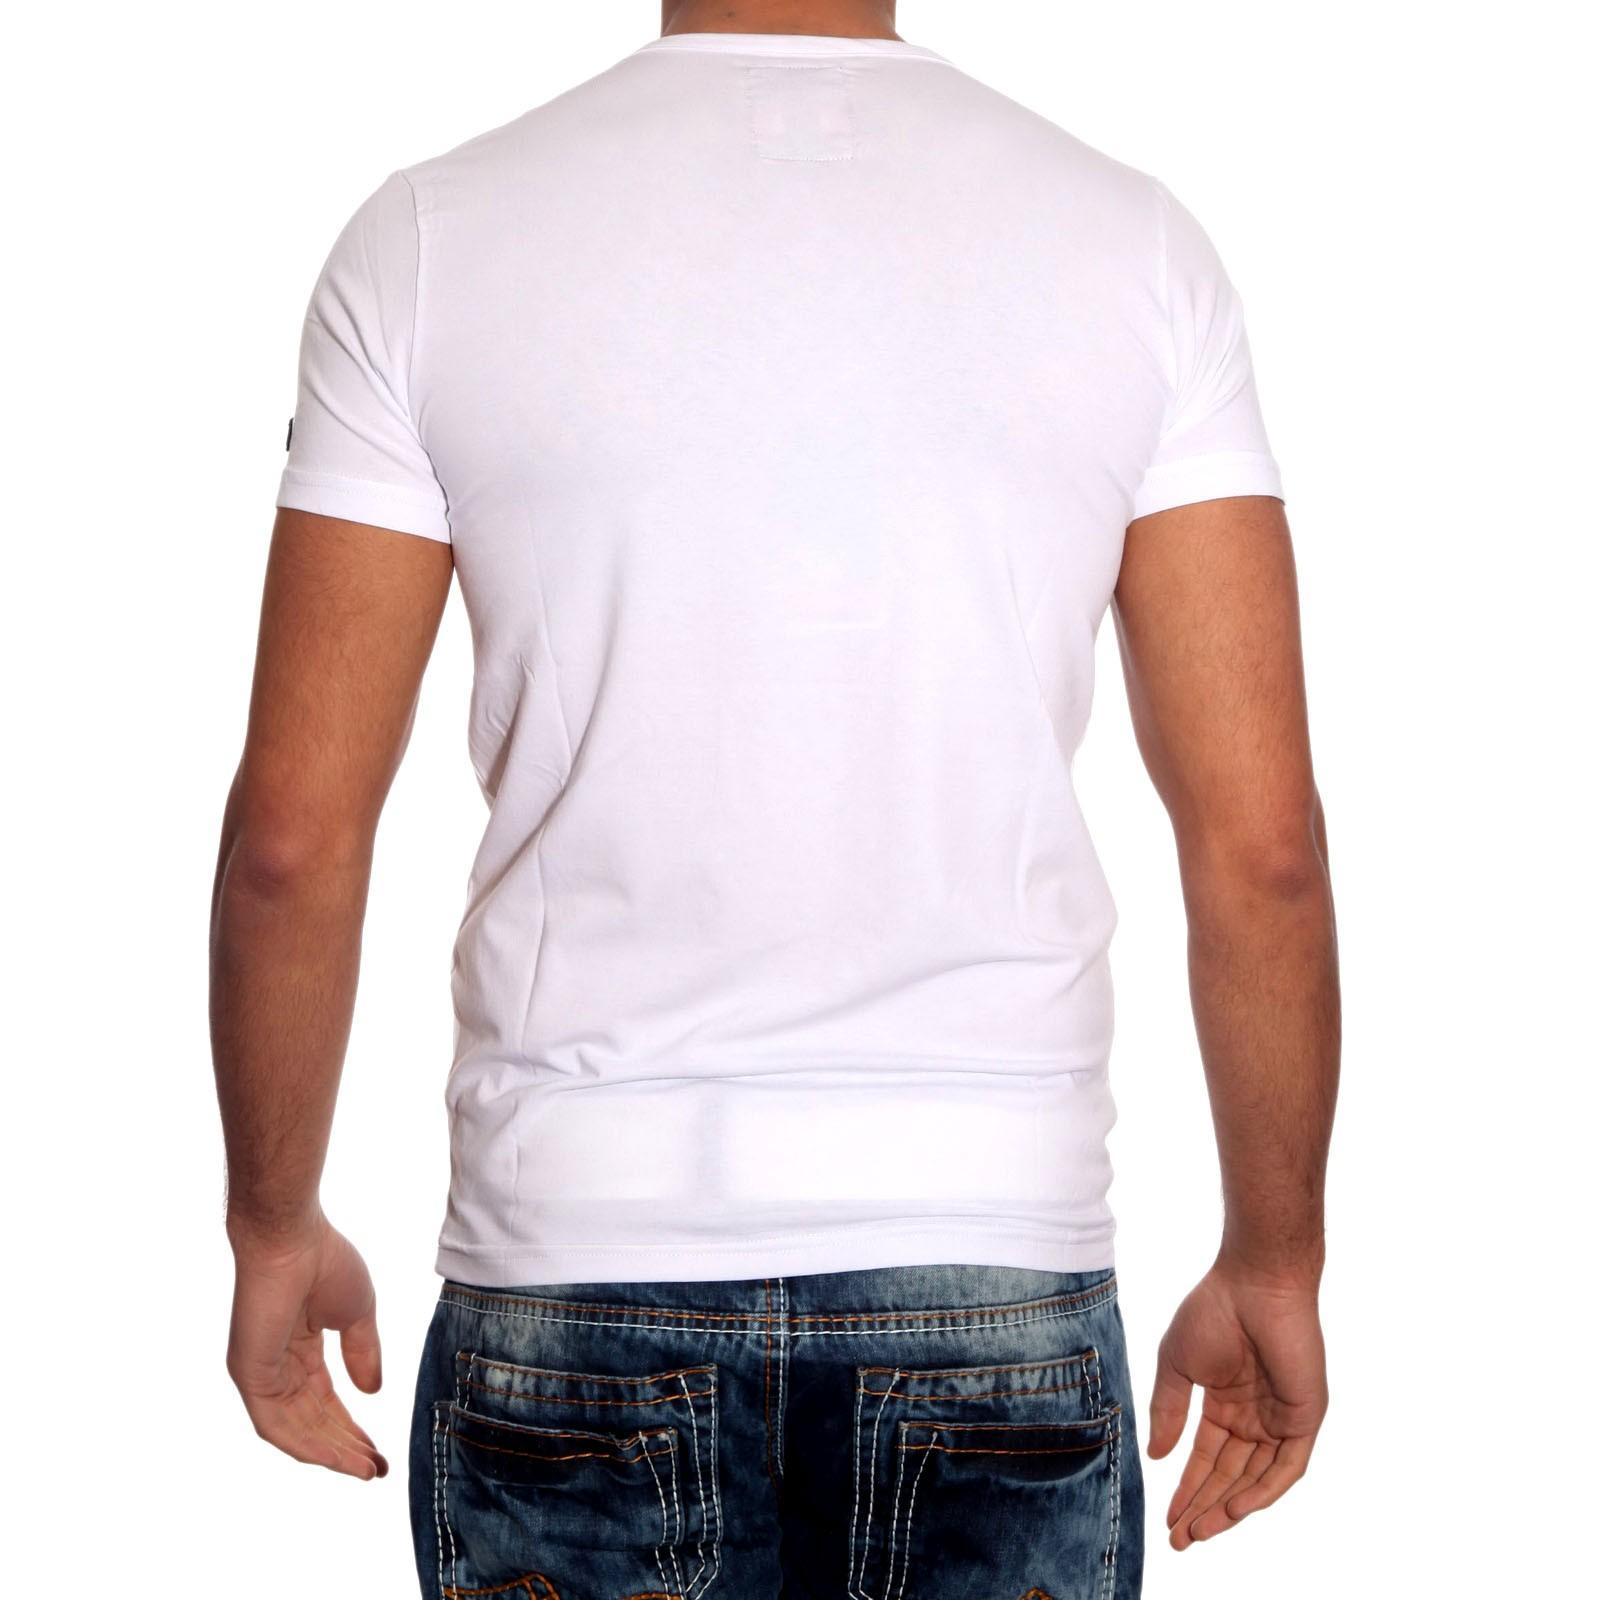 T-Shirt Weiß 6679 R-Neal